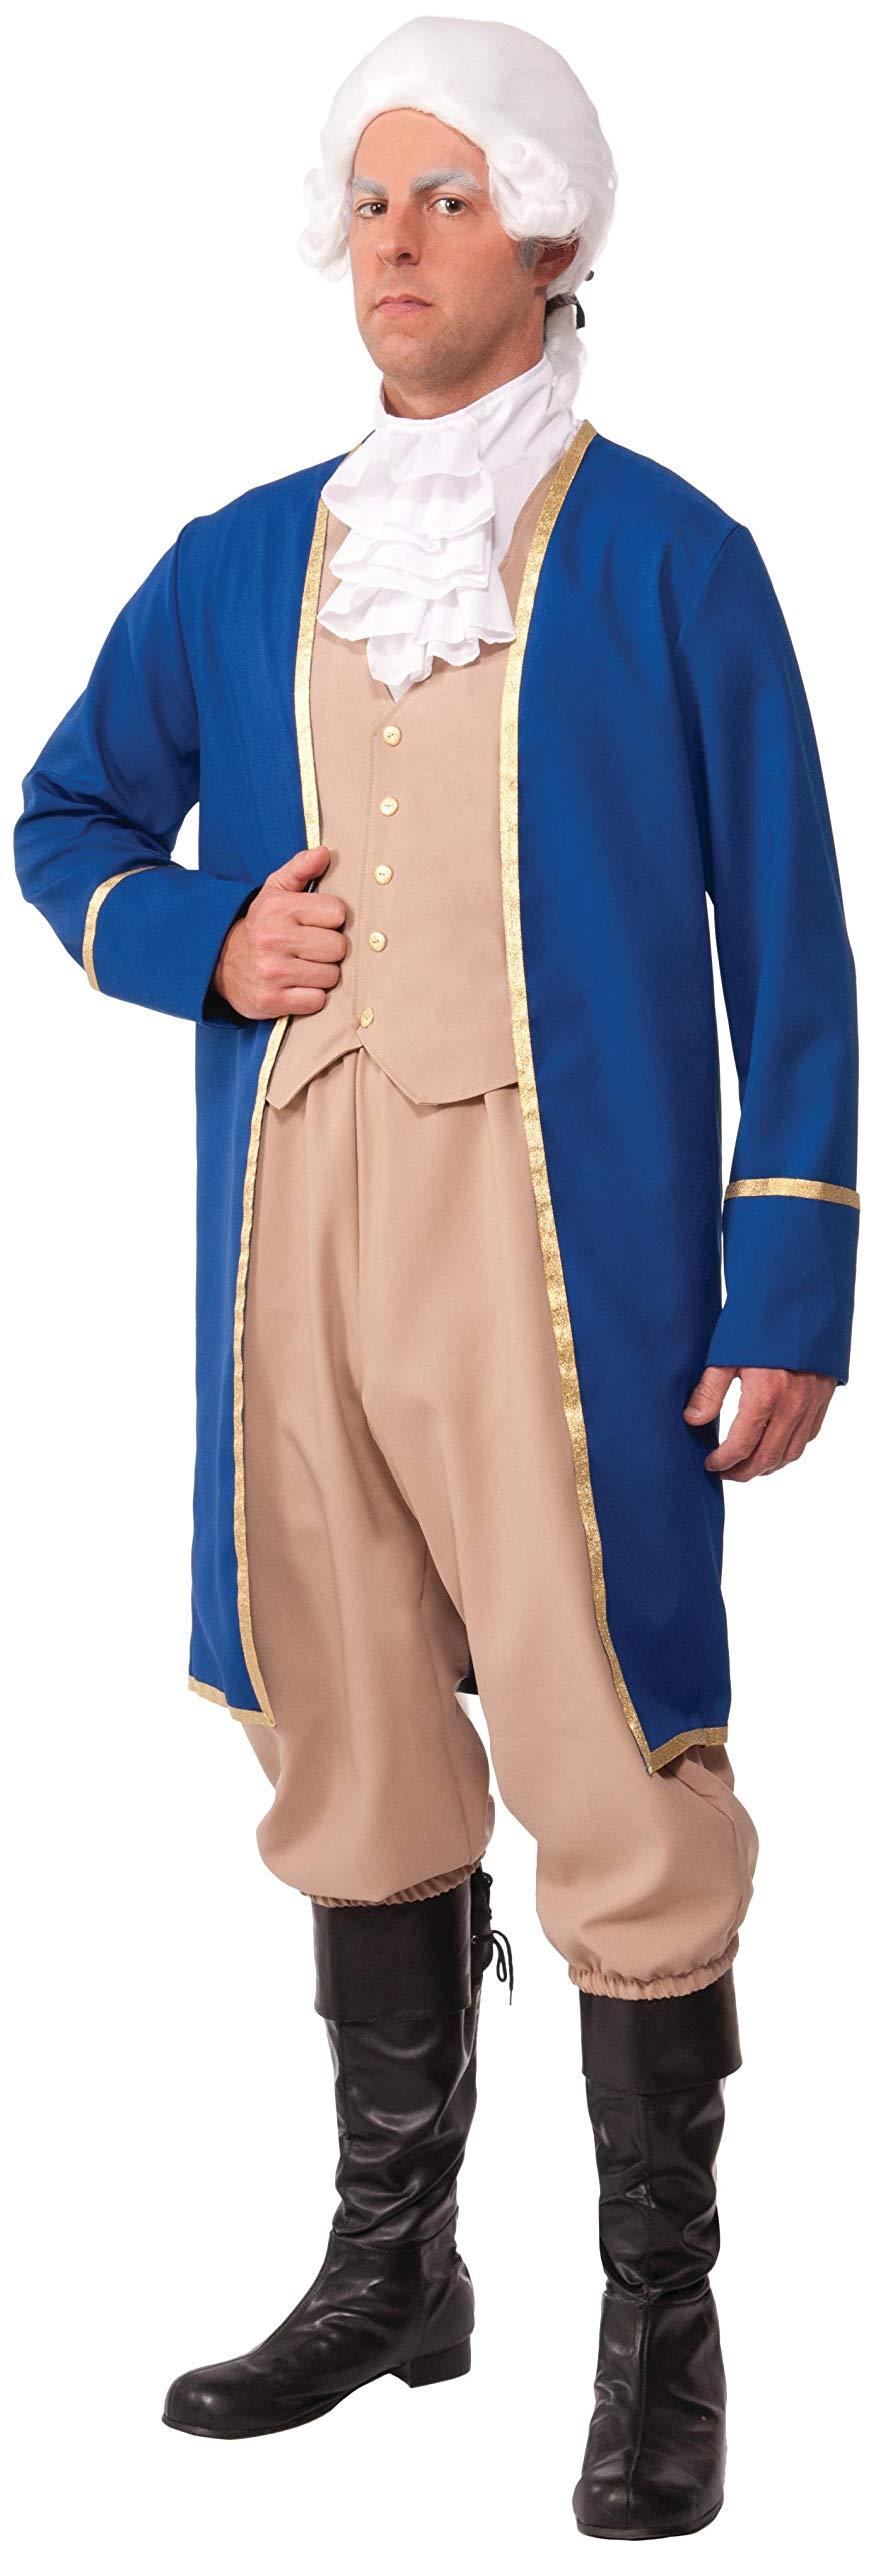 Forum Novelties Men's George Washington Deluxe Costume, Multi, Standard by Forum Novelties